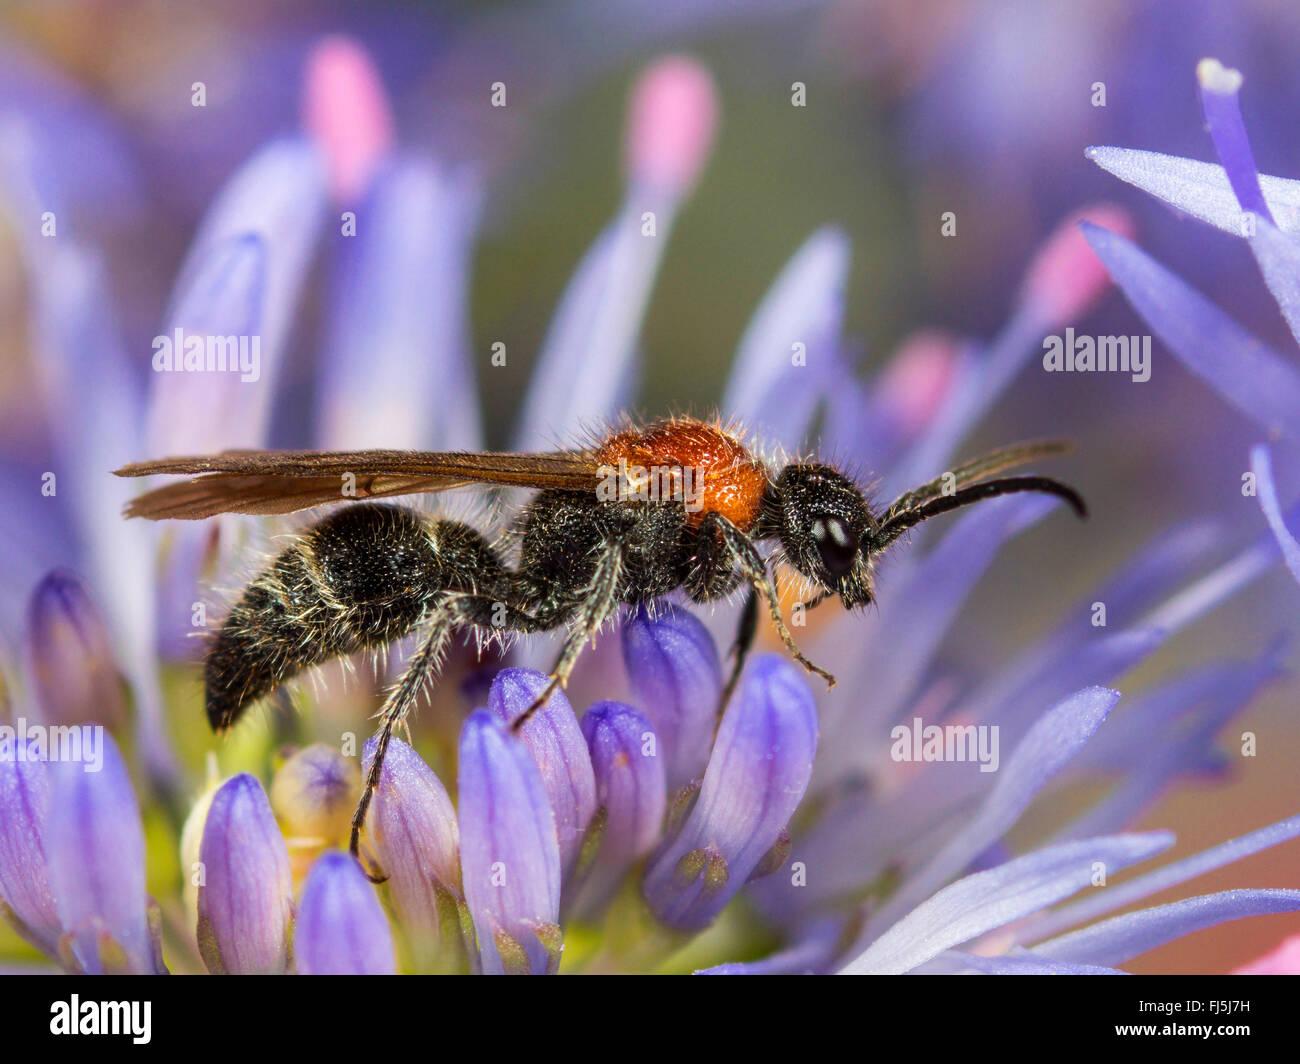 Bộ sưu tập Côn trùng - Page 49 Small-velvet-ant-smicromyrme-rufipes-mutilla-rufipes-male-on-sheeps-FJ5J7H